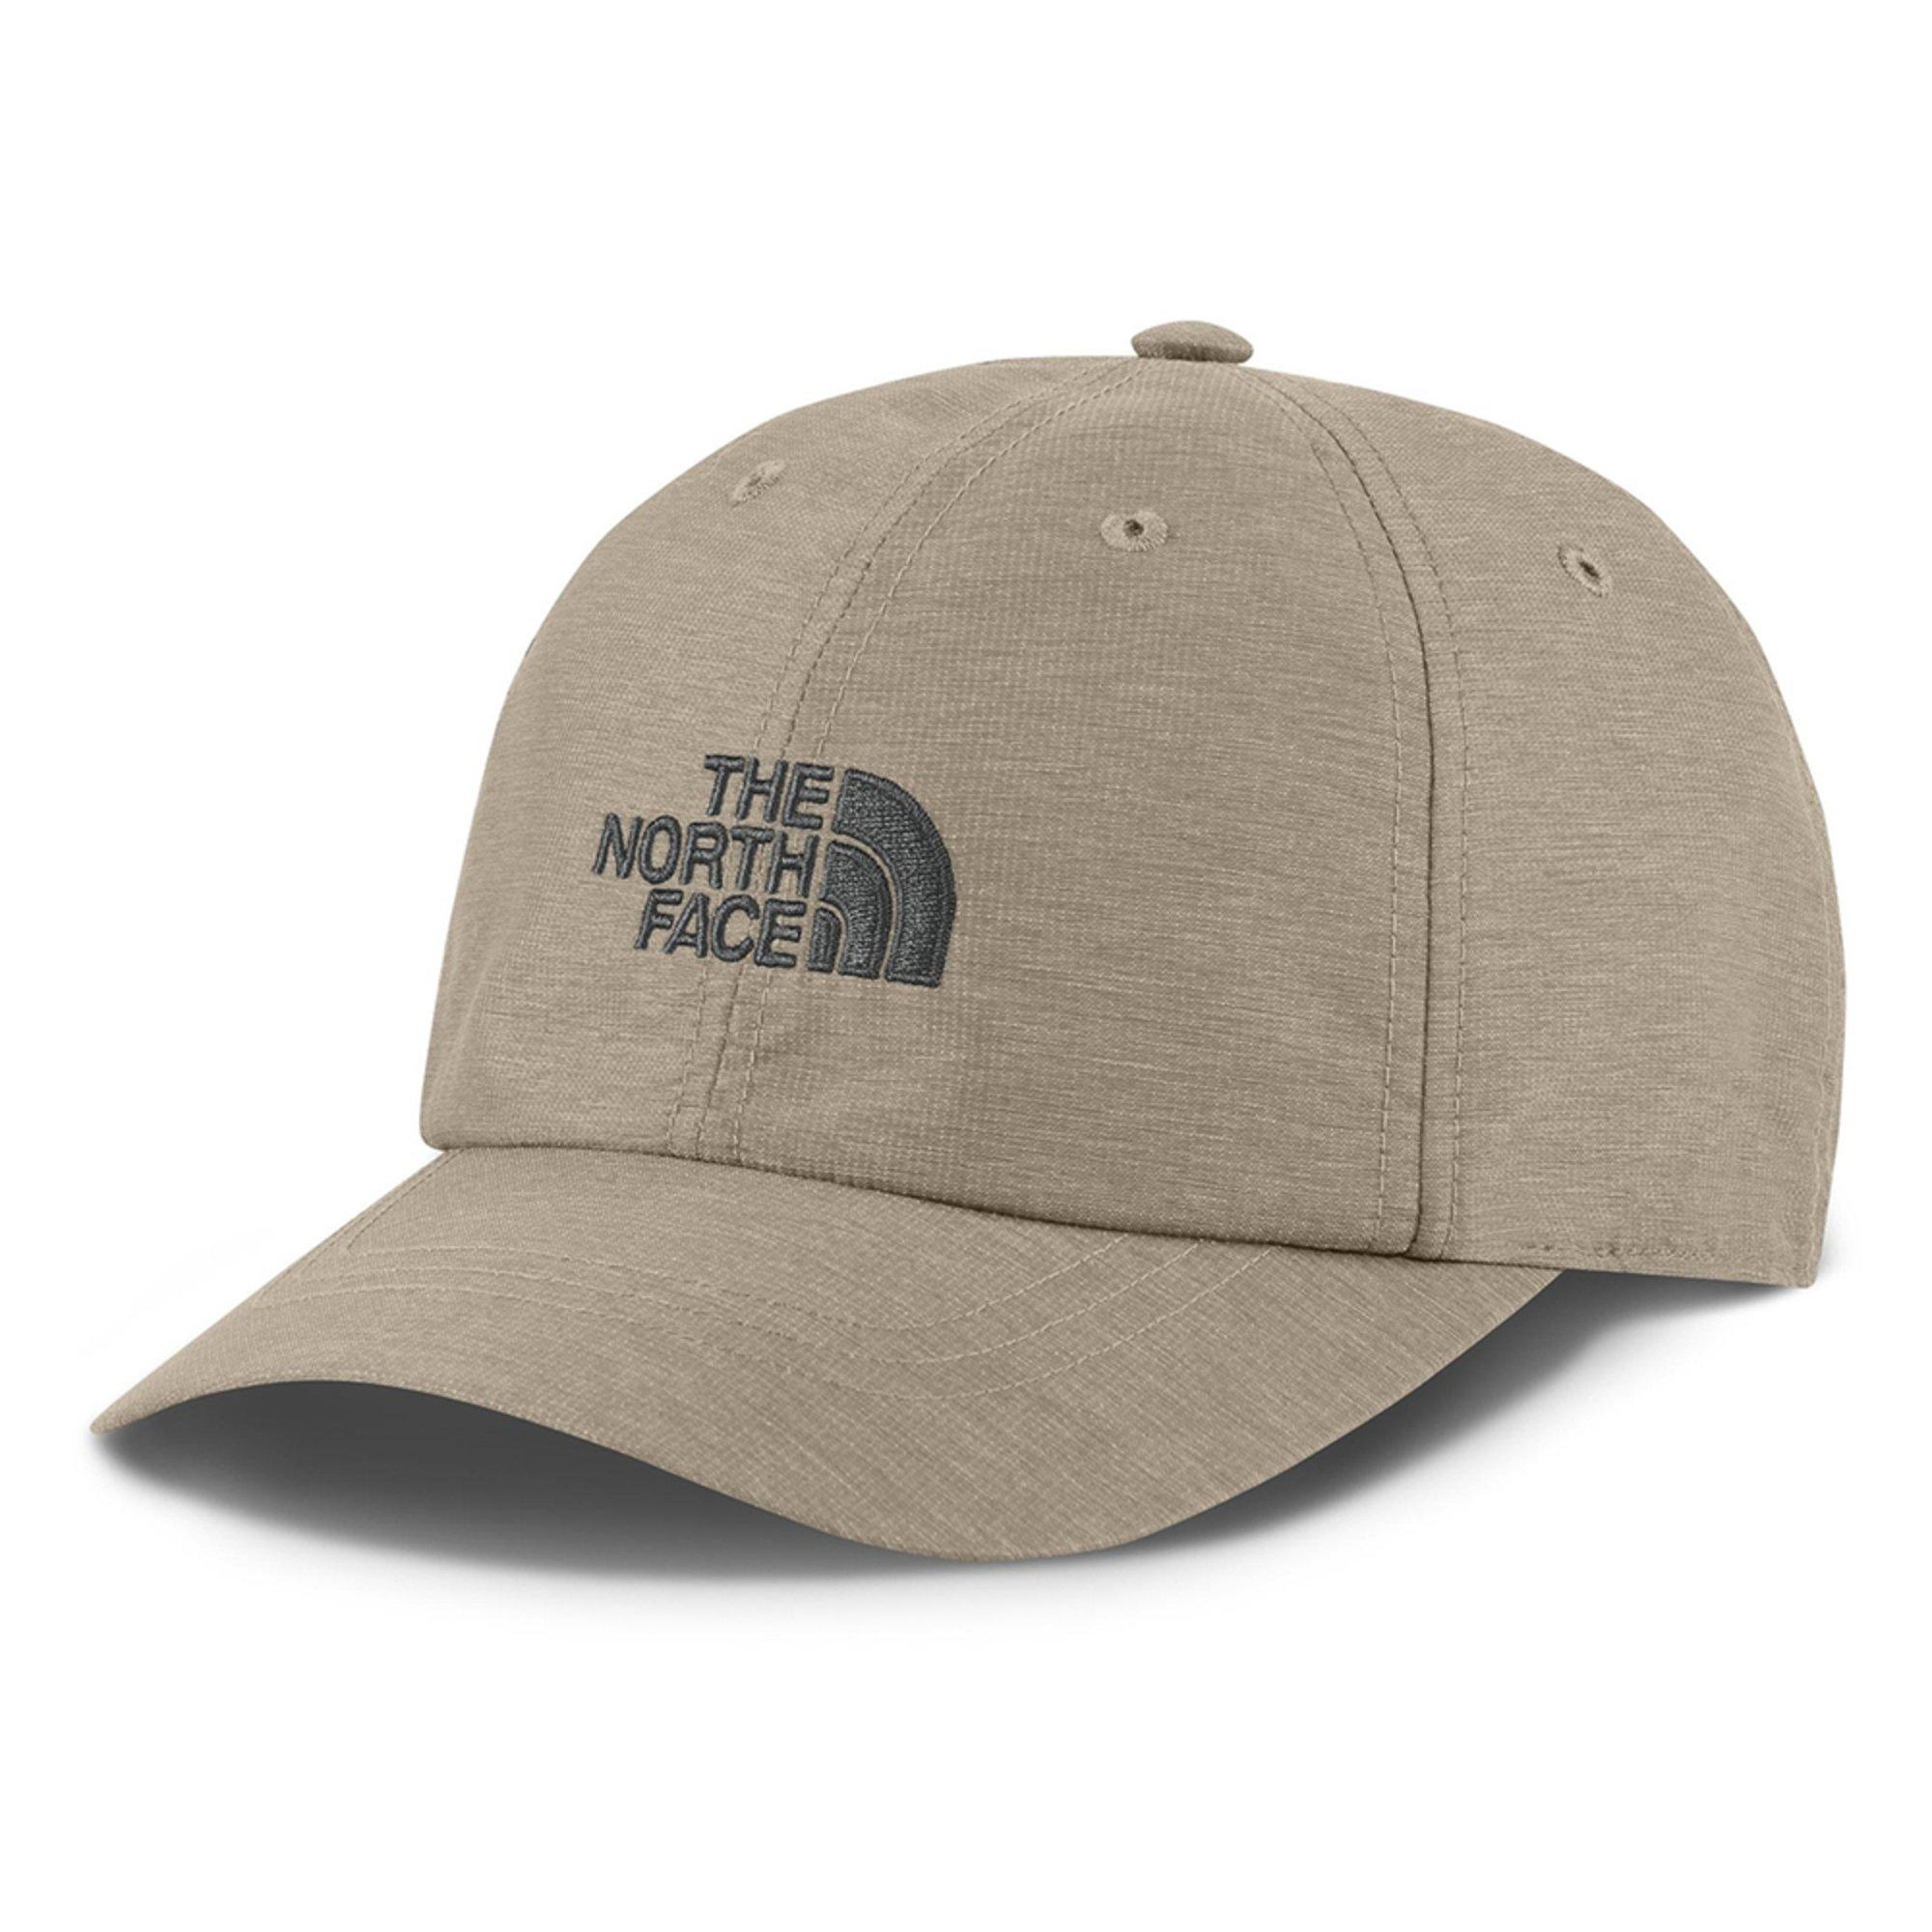 3ca1e4bbada The North Face. The North Face Men s Horizon Hat ...